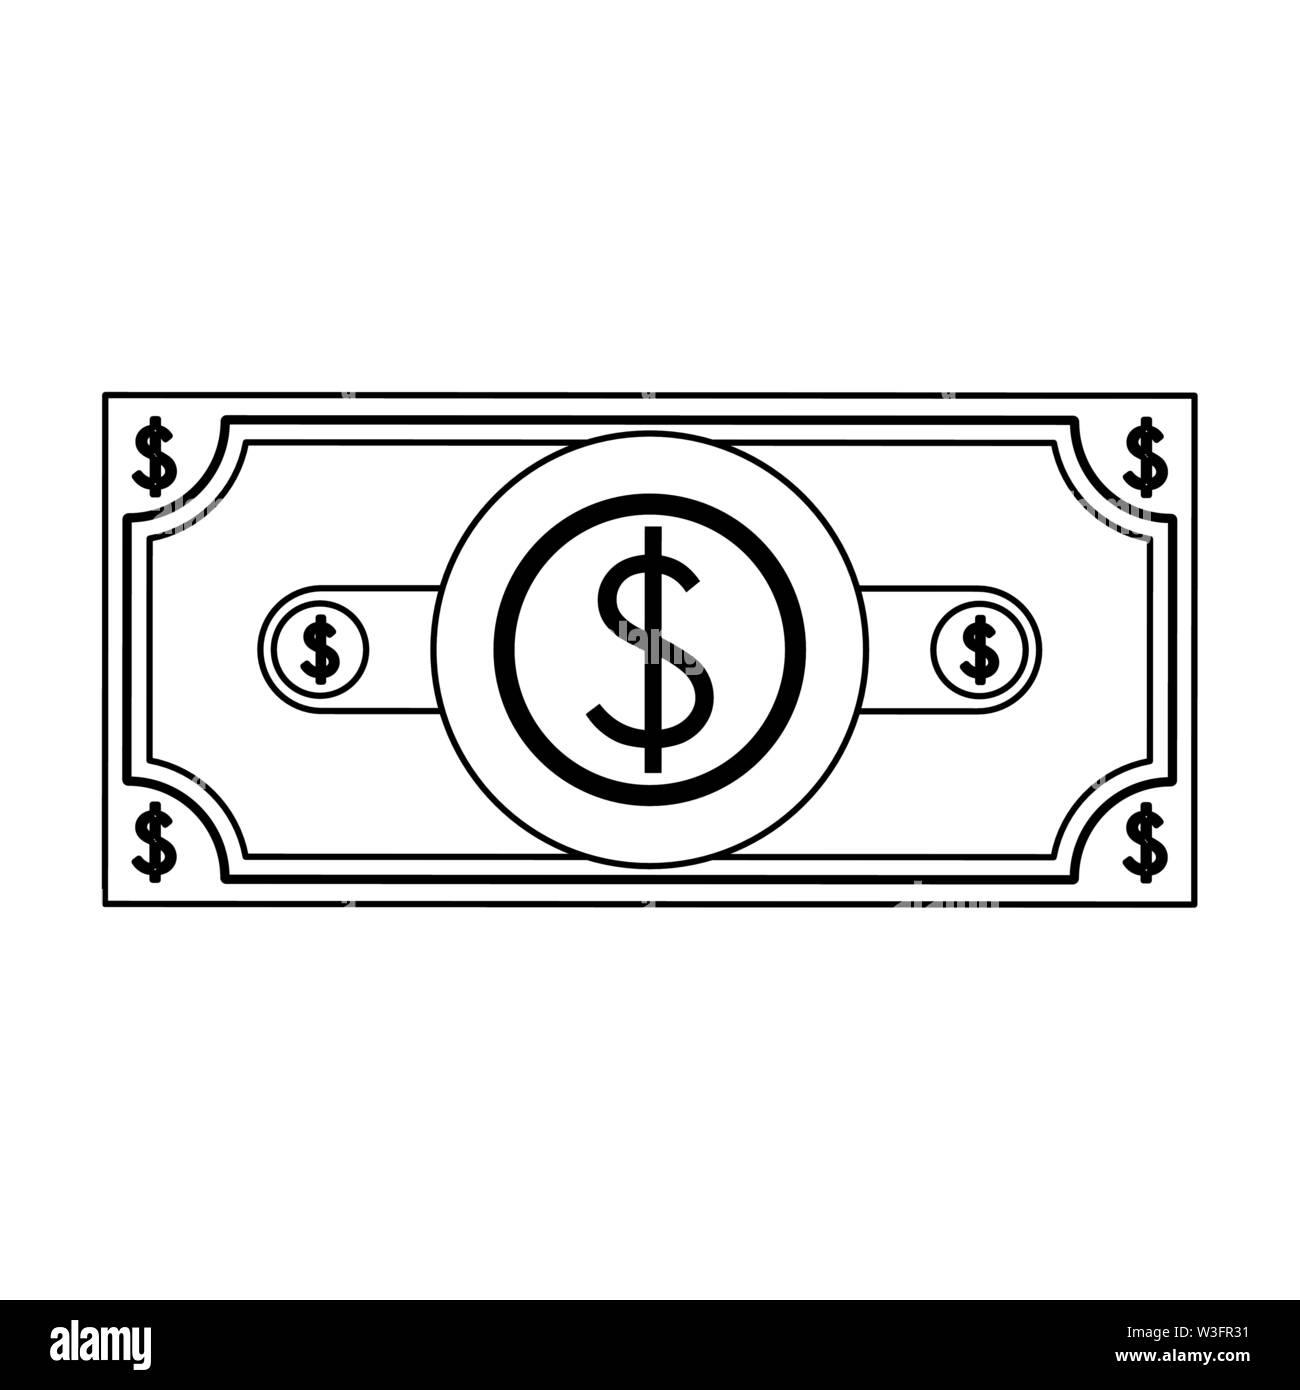 Geld sparen cash Bill cartoon Vector Illustration graphic design Stockbild